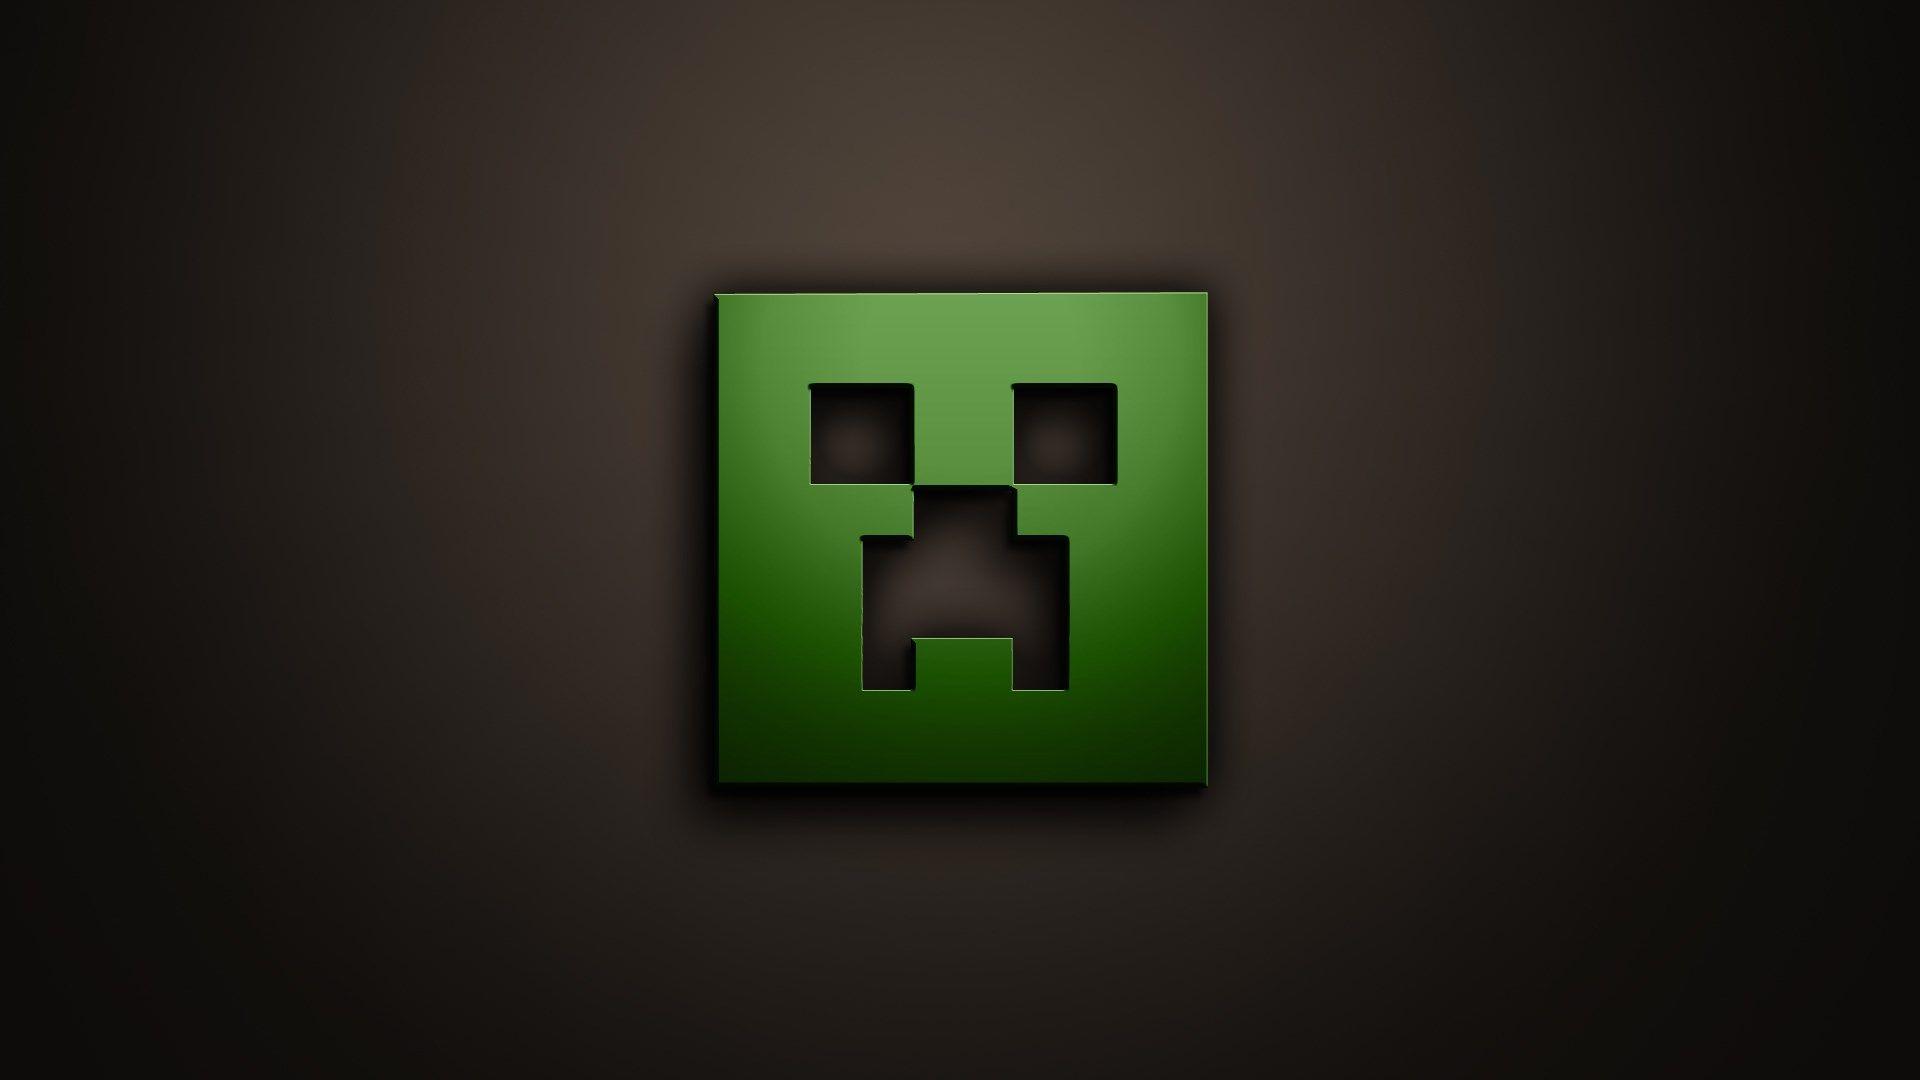 Must see Wallpaper Minecraft Laptop - b5907ab3597b3e503d4b2d8c9d6f5a27  Best Photo Reference_182221.jpg